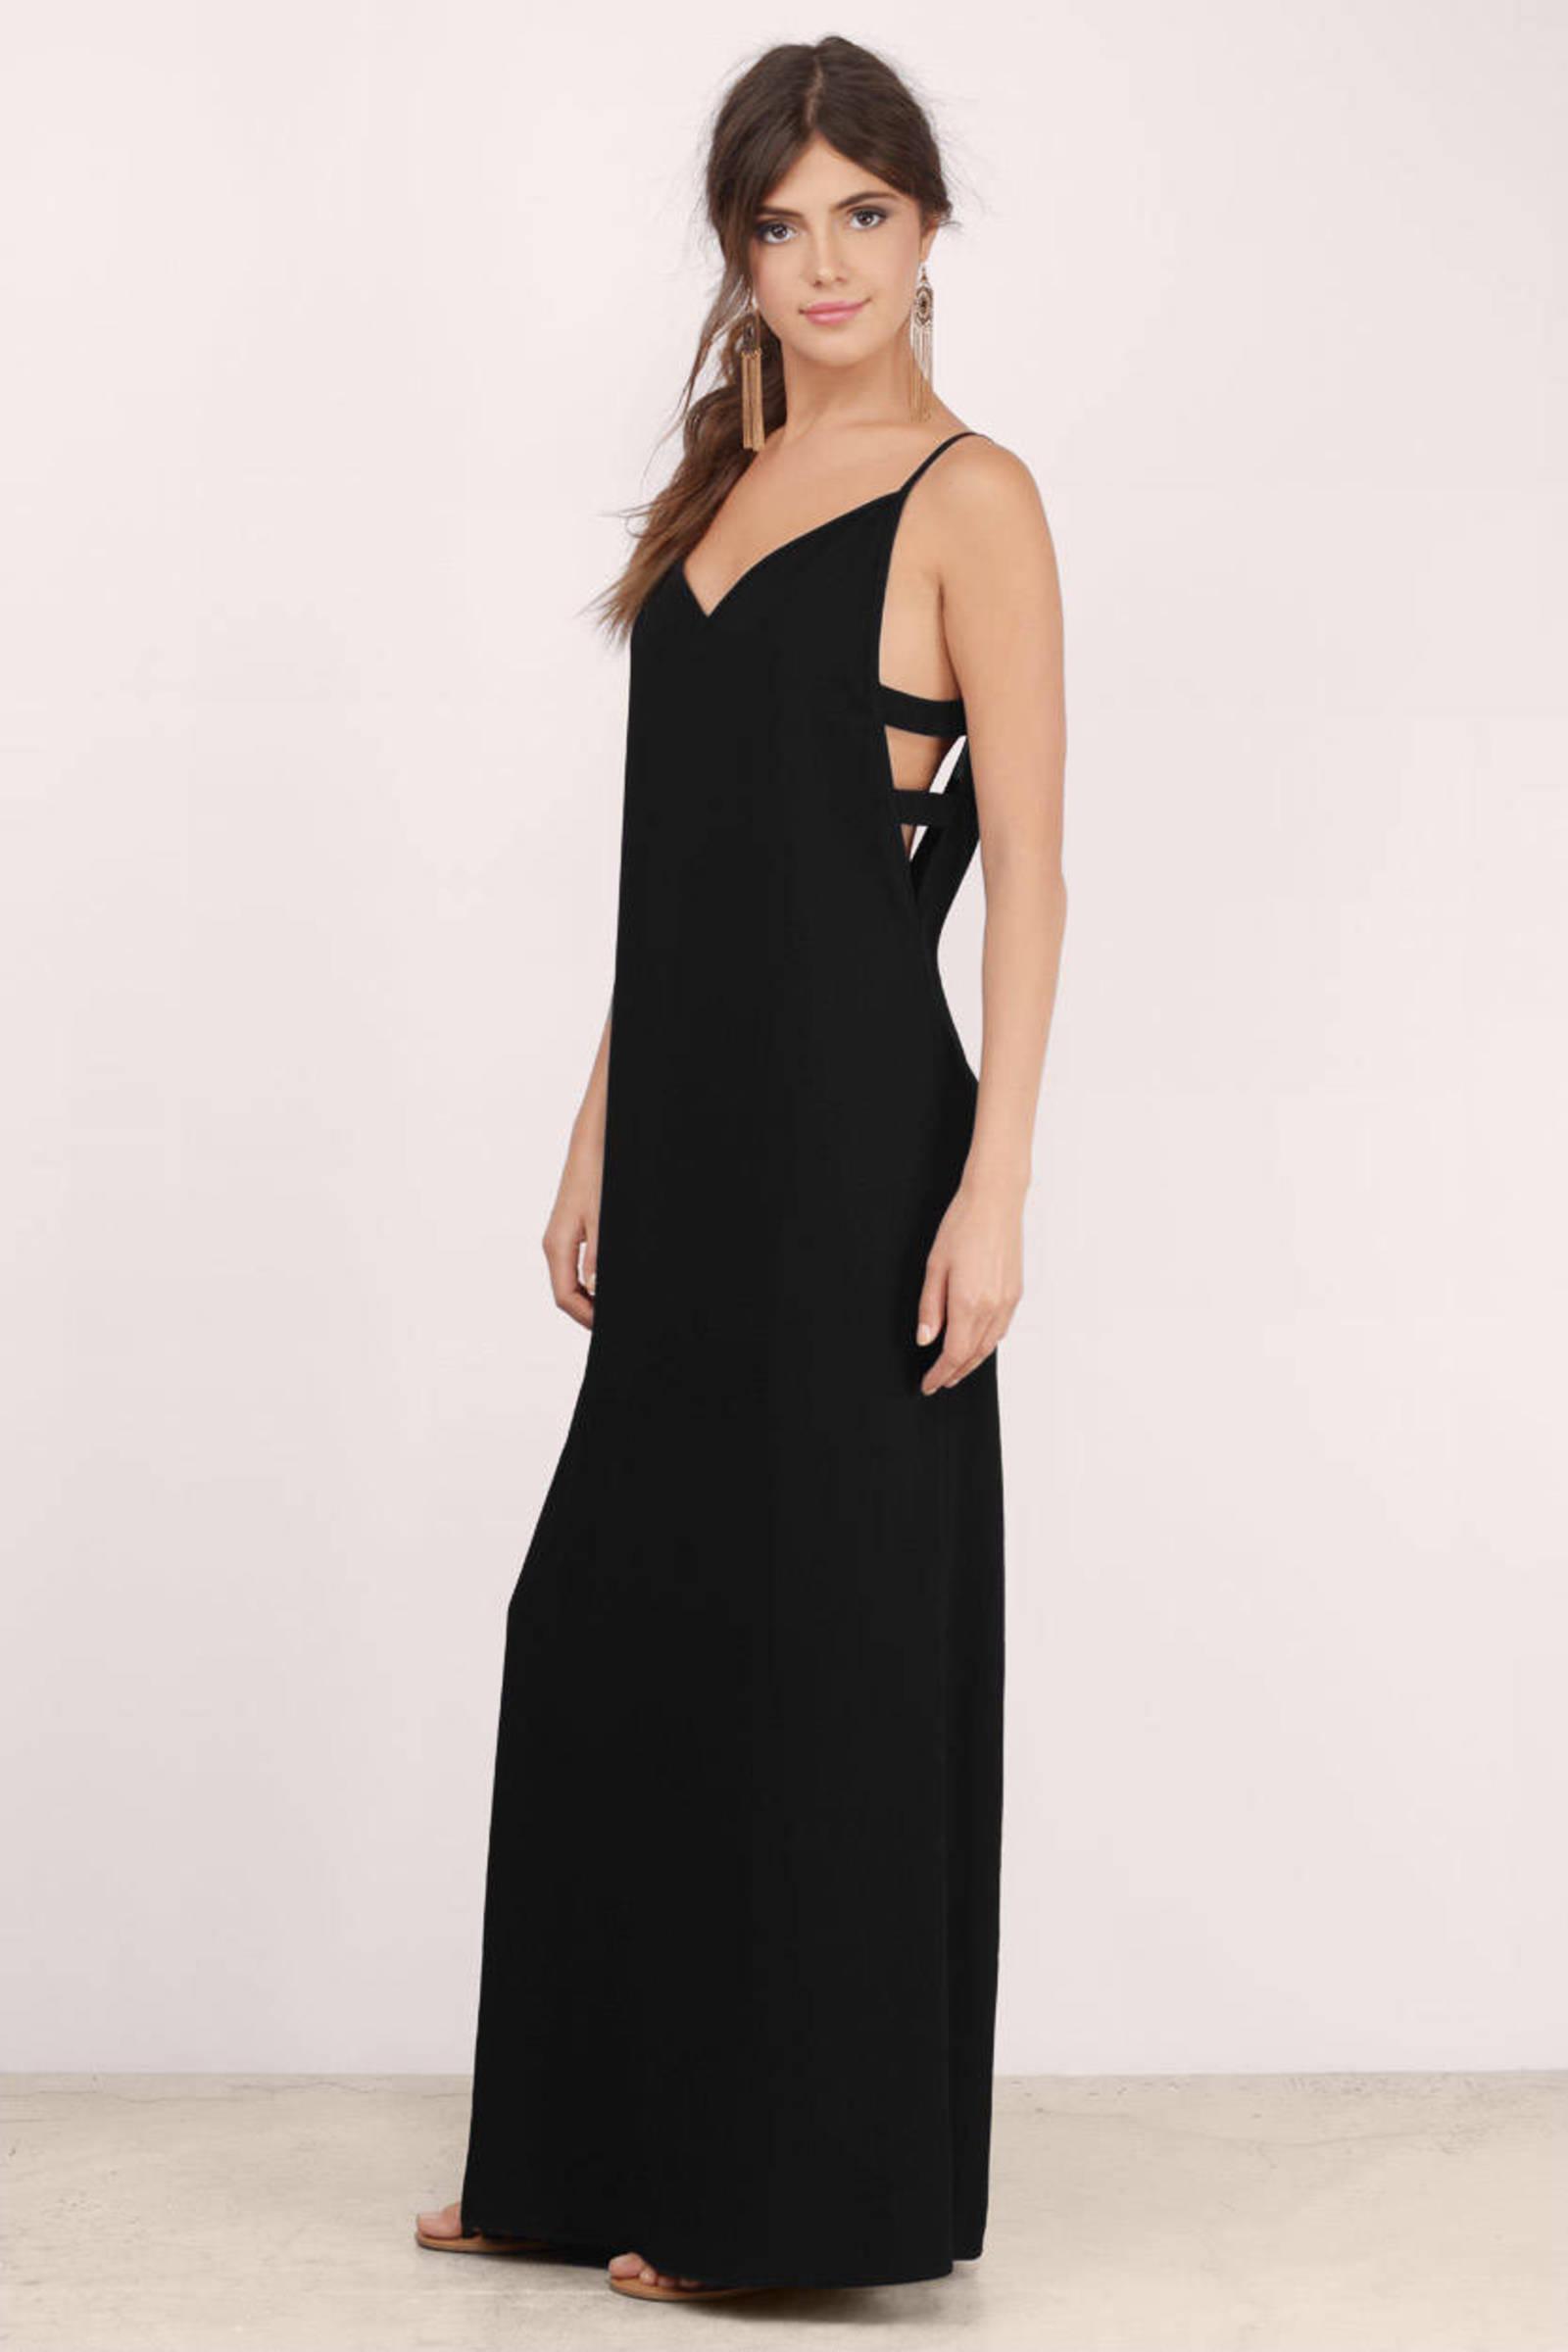 Sexy Taupe Maxi Dress - Brown Dress - Cut Out Dress - $16.00